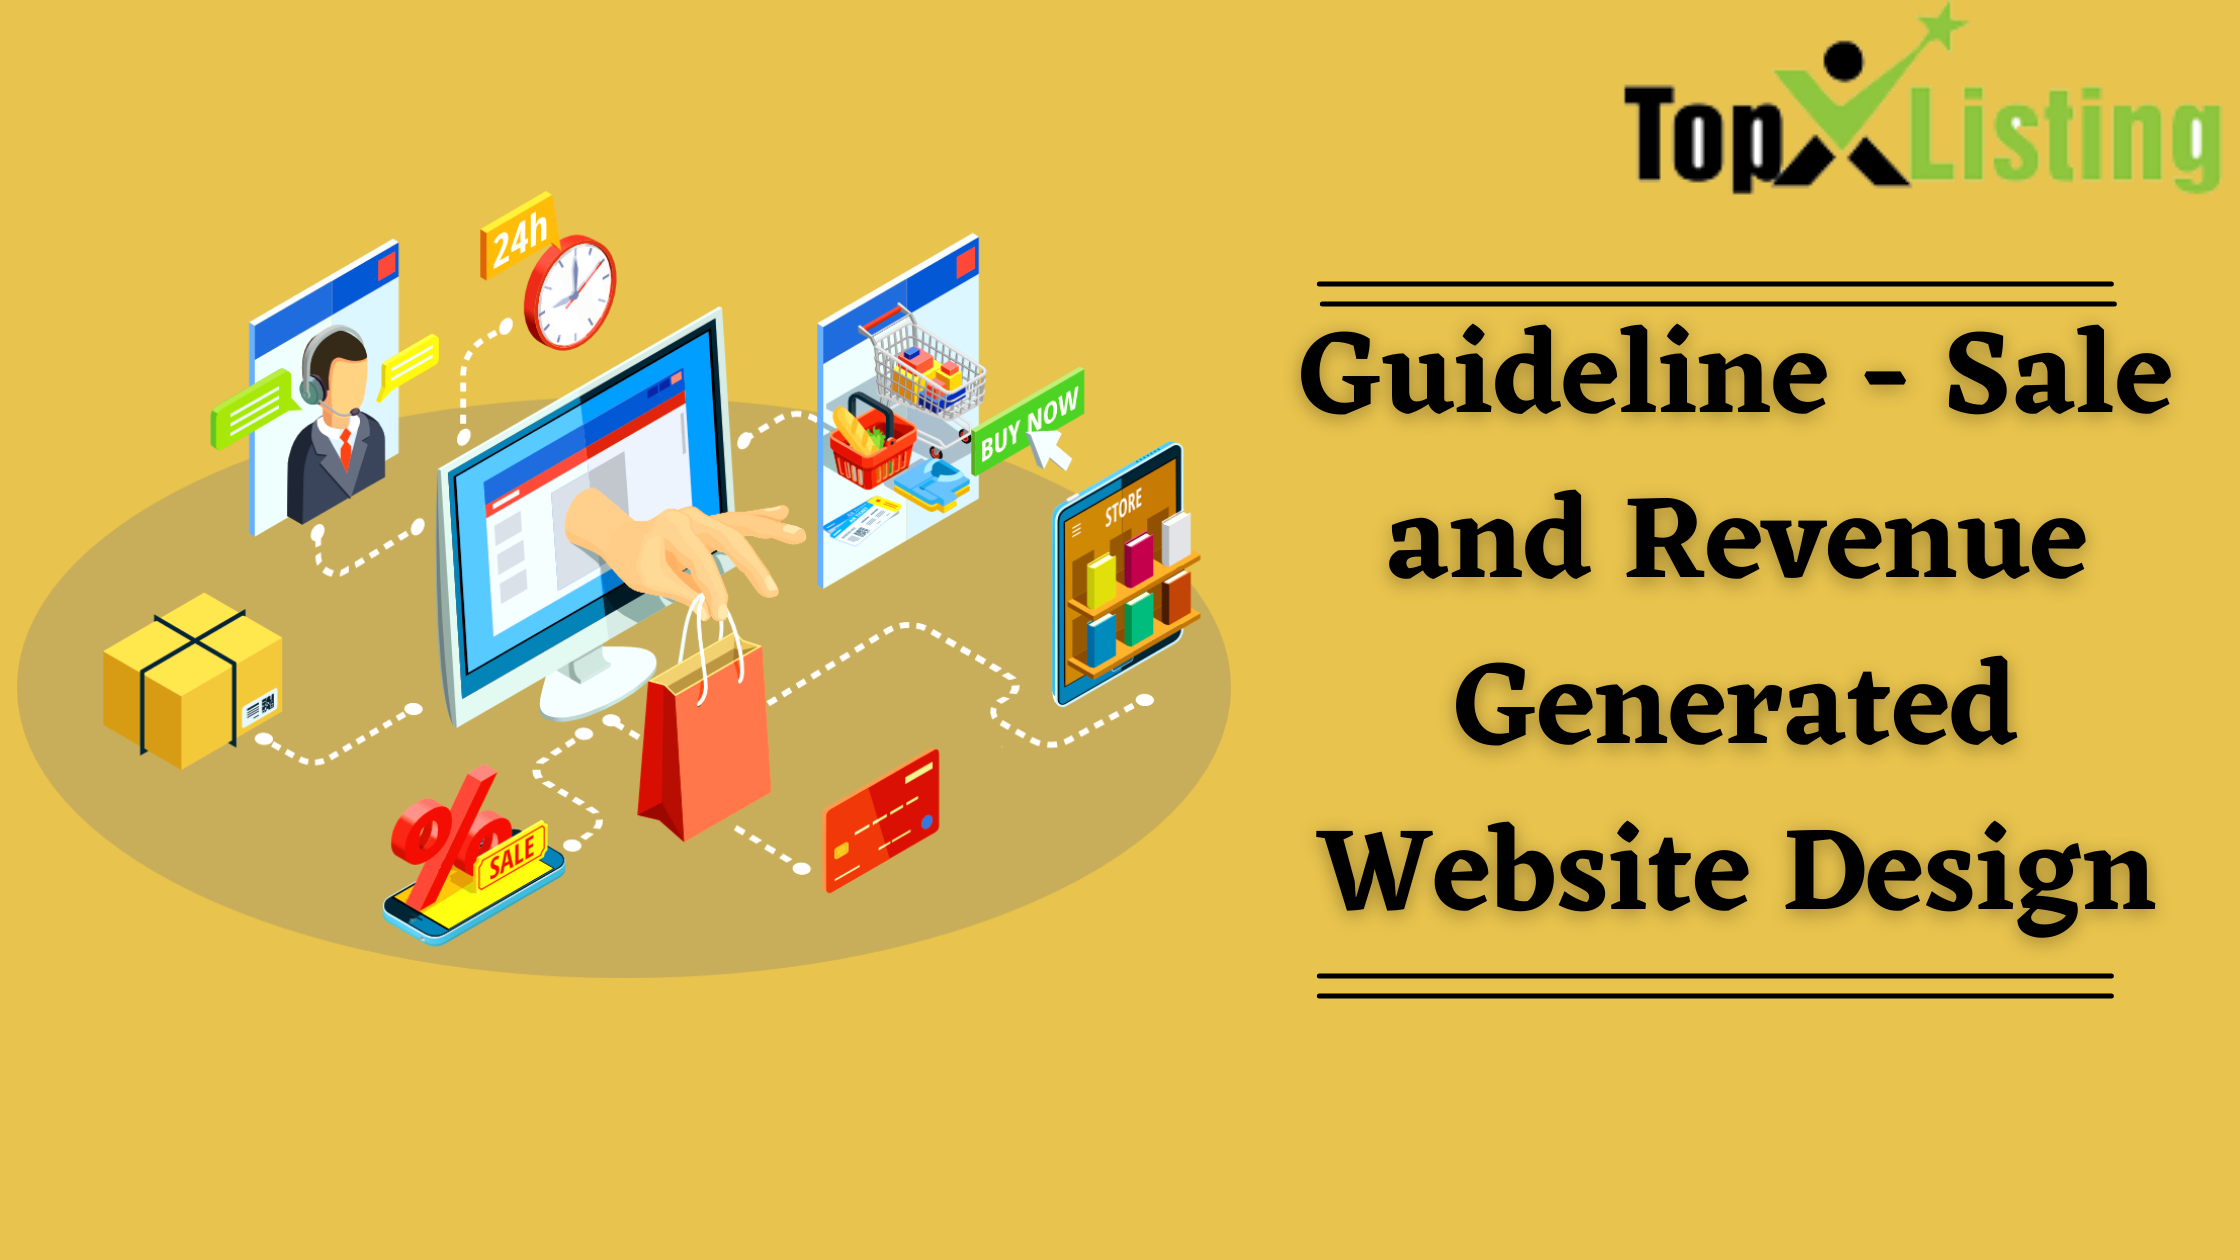 Guideline – Sale and Revenue Generated Website Design